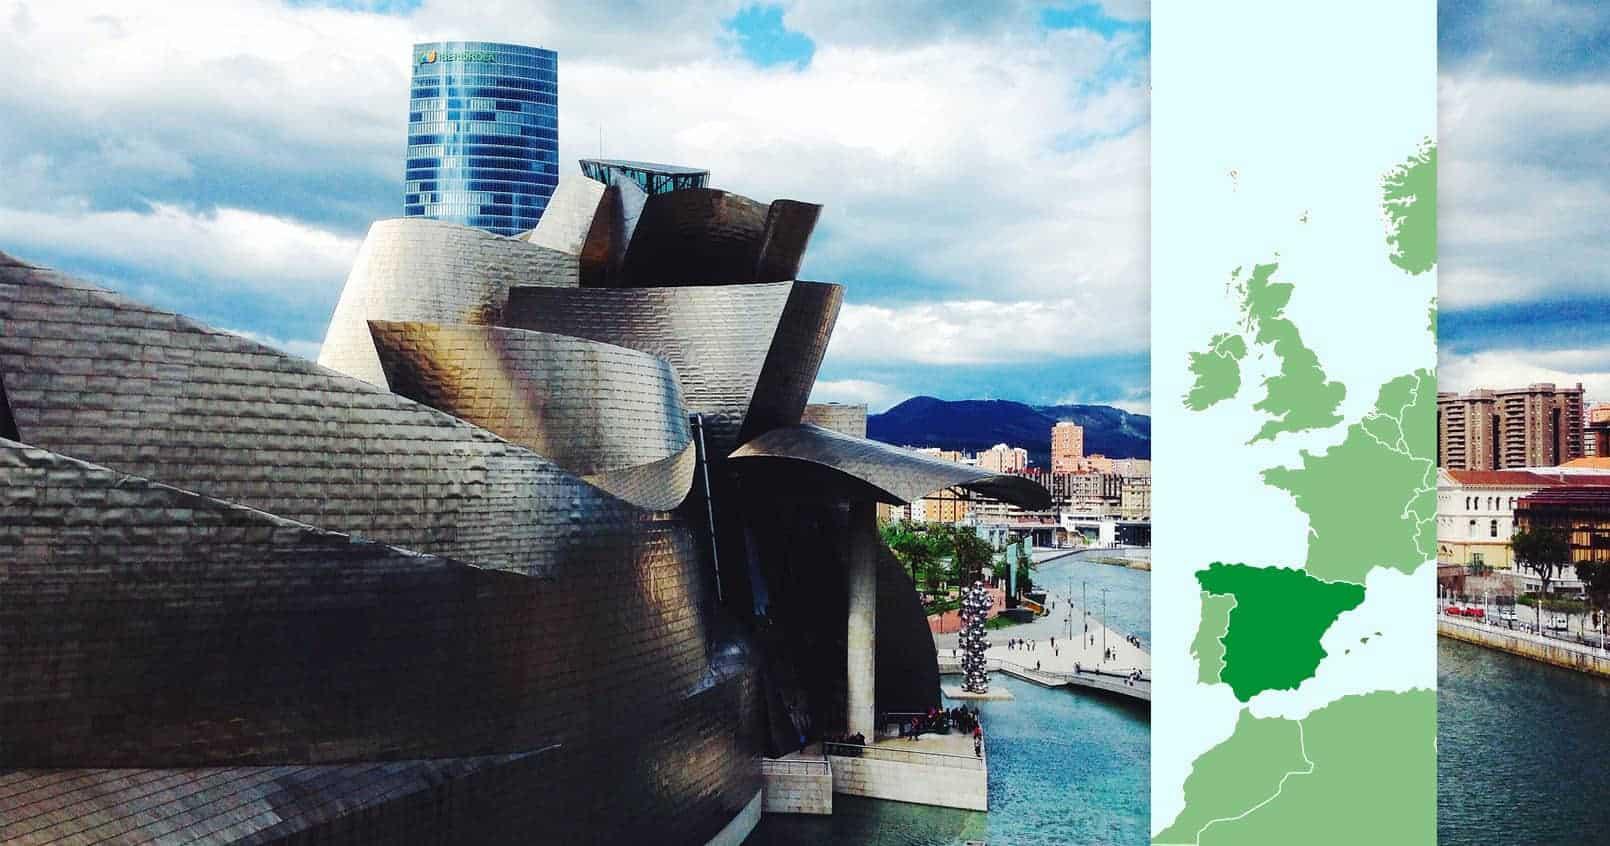 Spania, Bilbao, Guggenheim museum, ReisDit.no